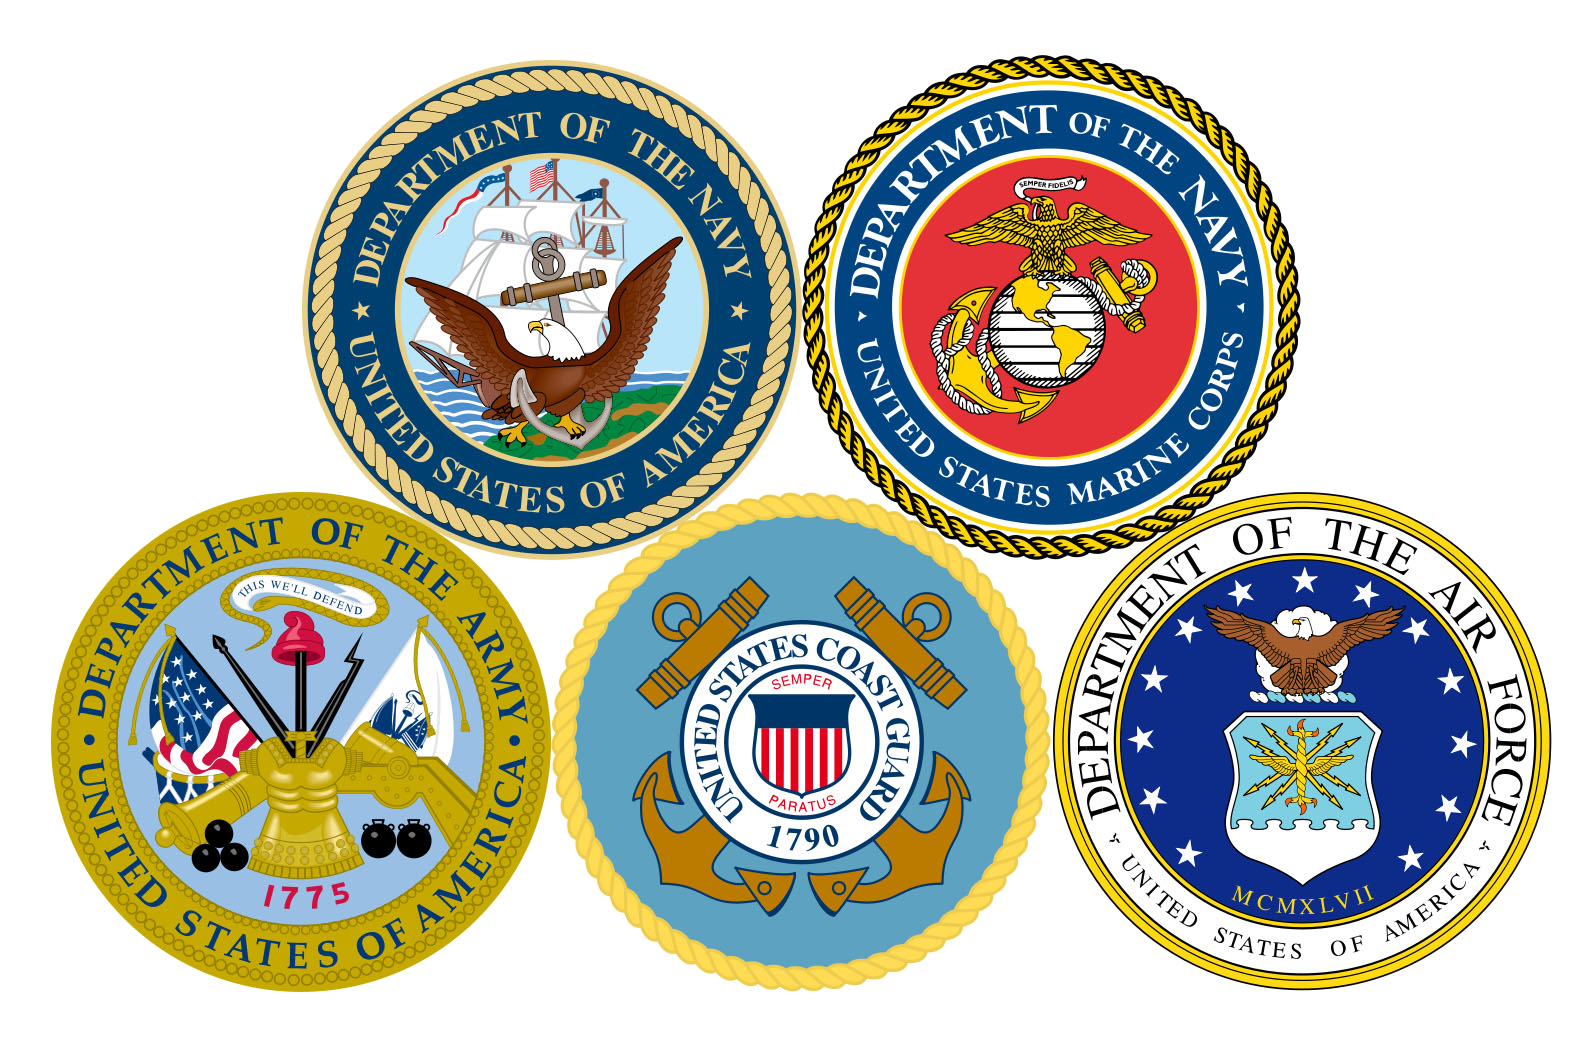 Military Logos Group 3 - 1593 x 1044